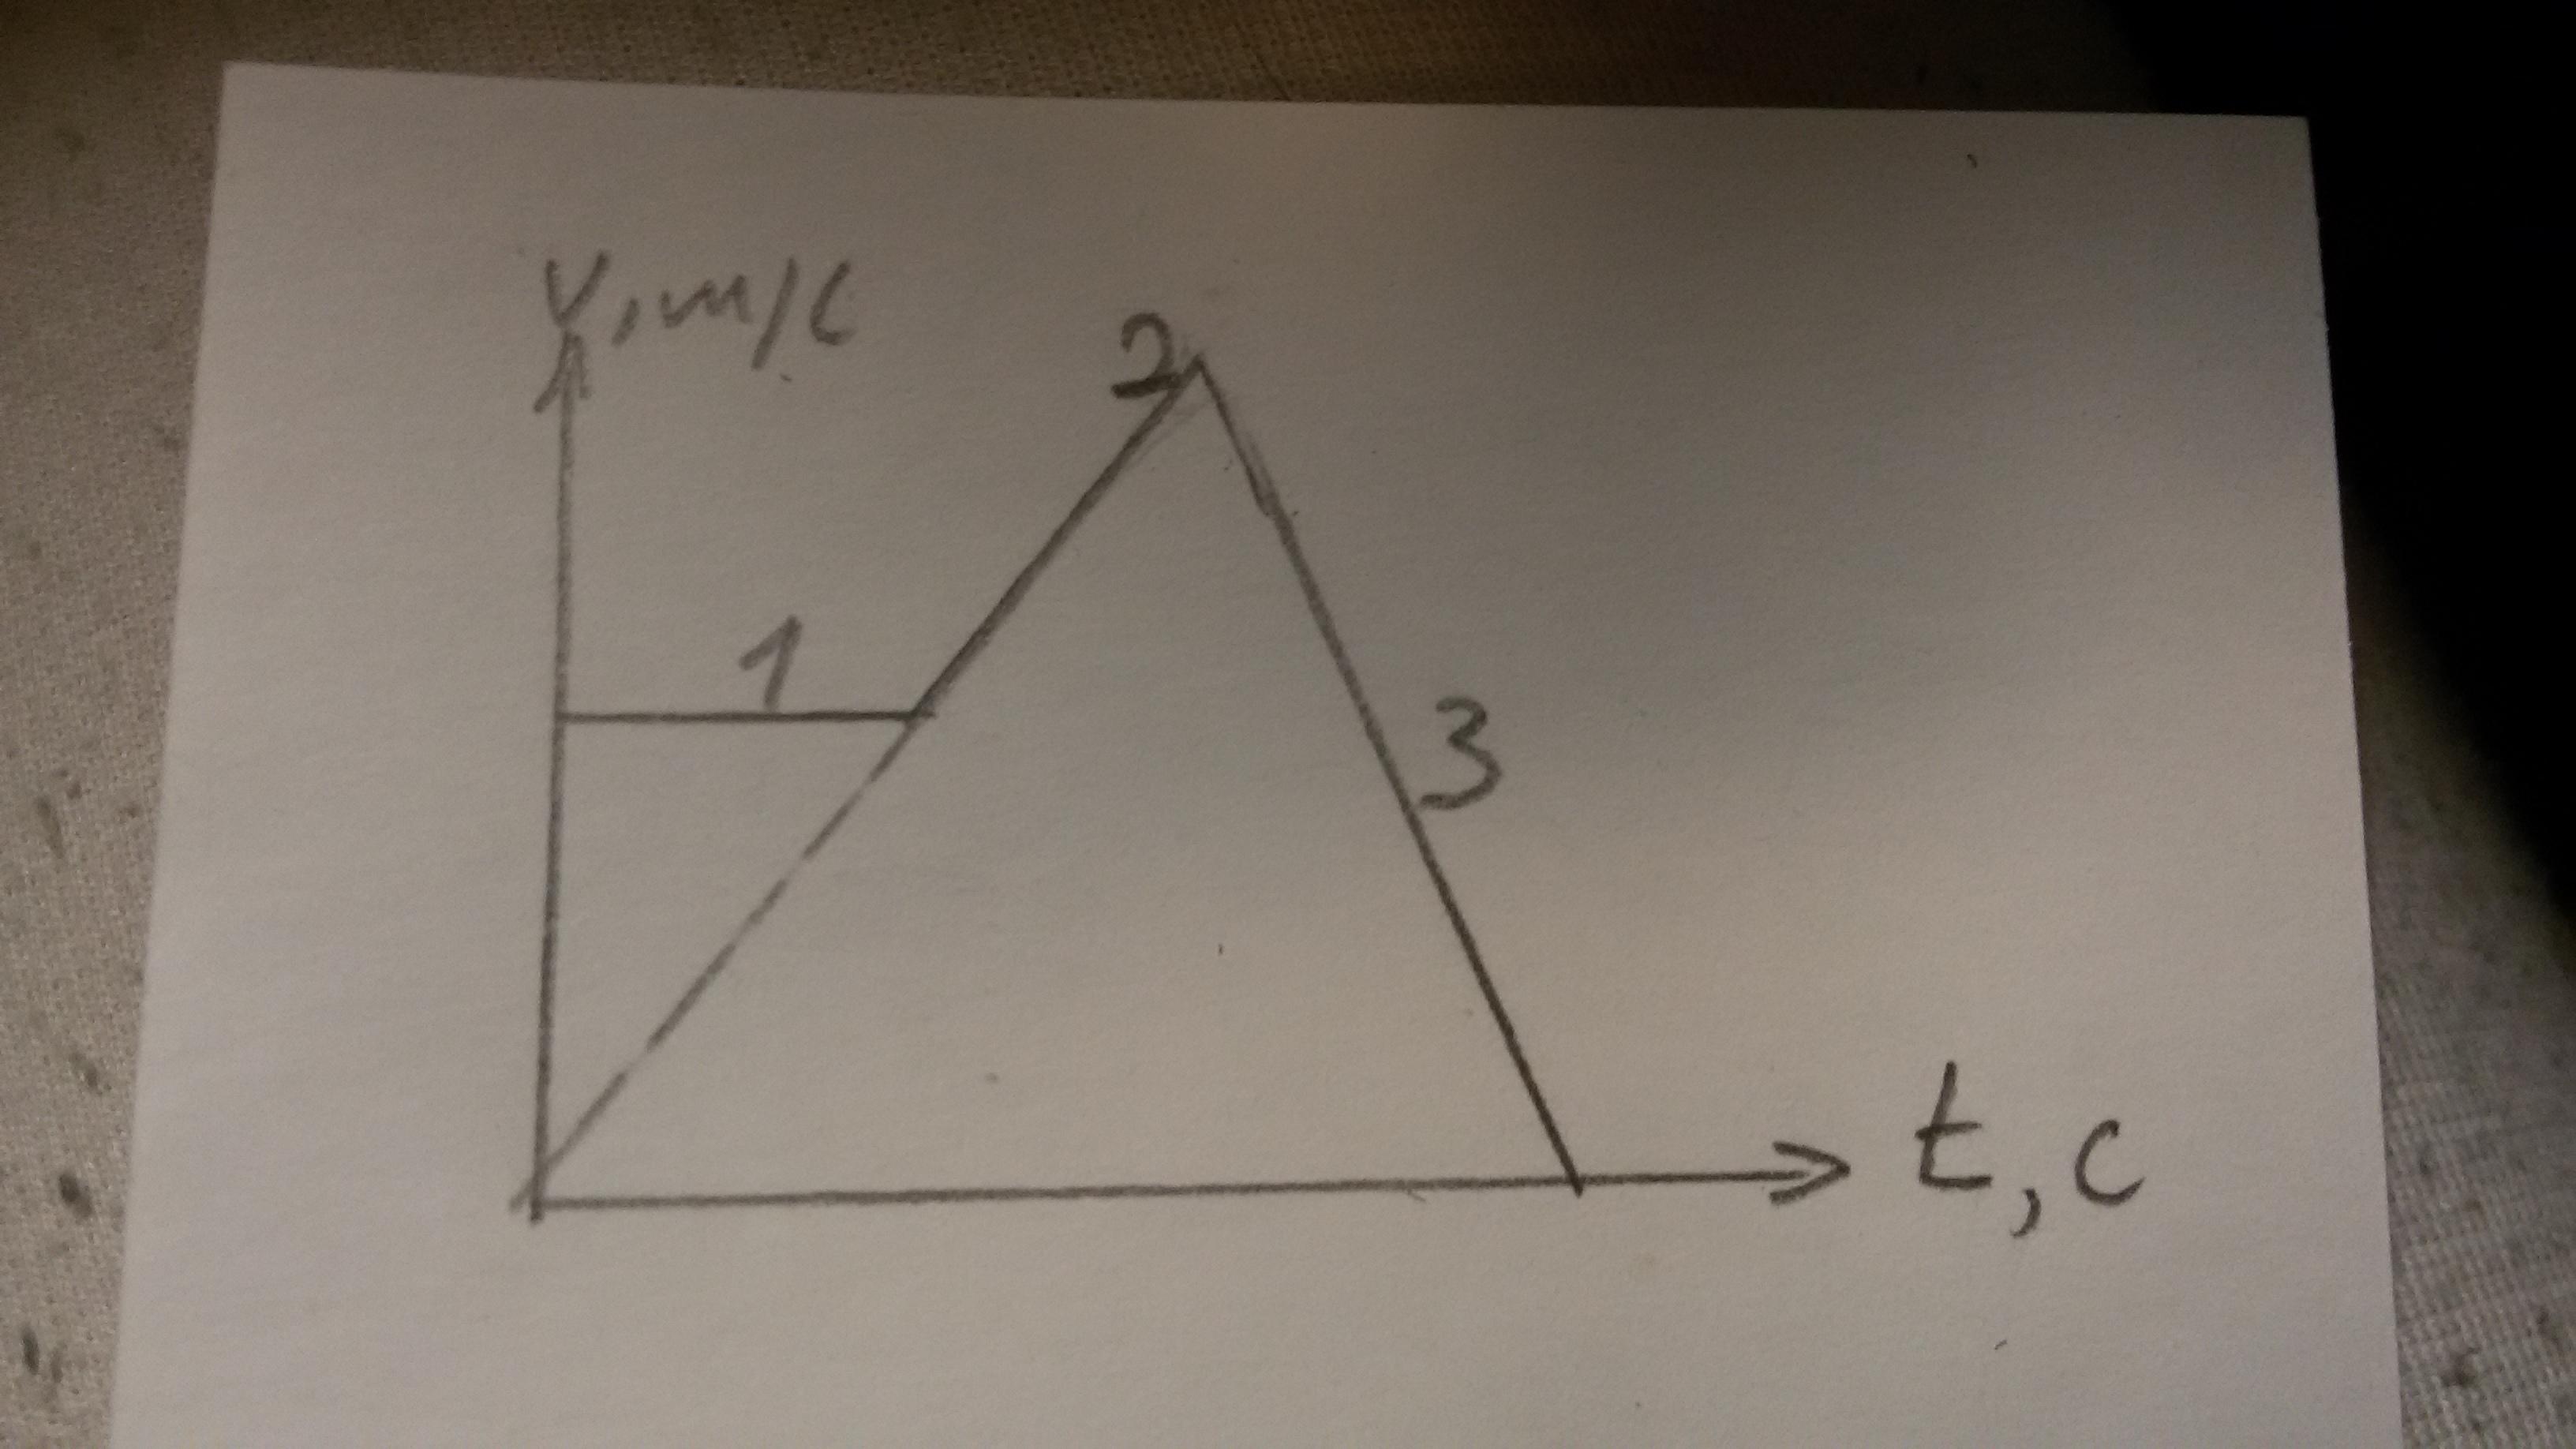 На рисунке приведен график зависимости скорости движения тела от времени. Определите характер движения на участках 1, 2, 3.